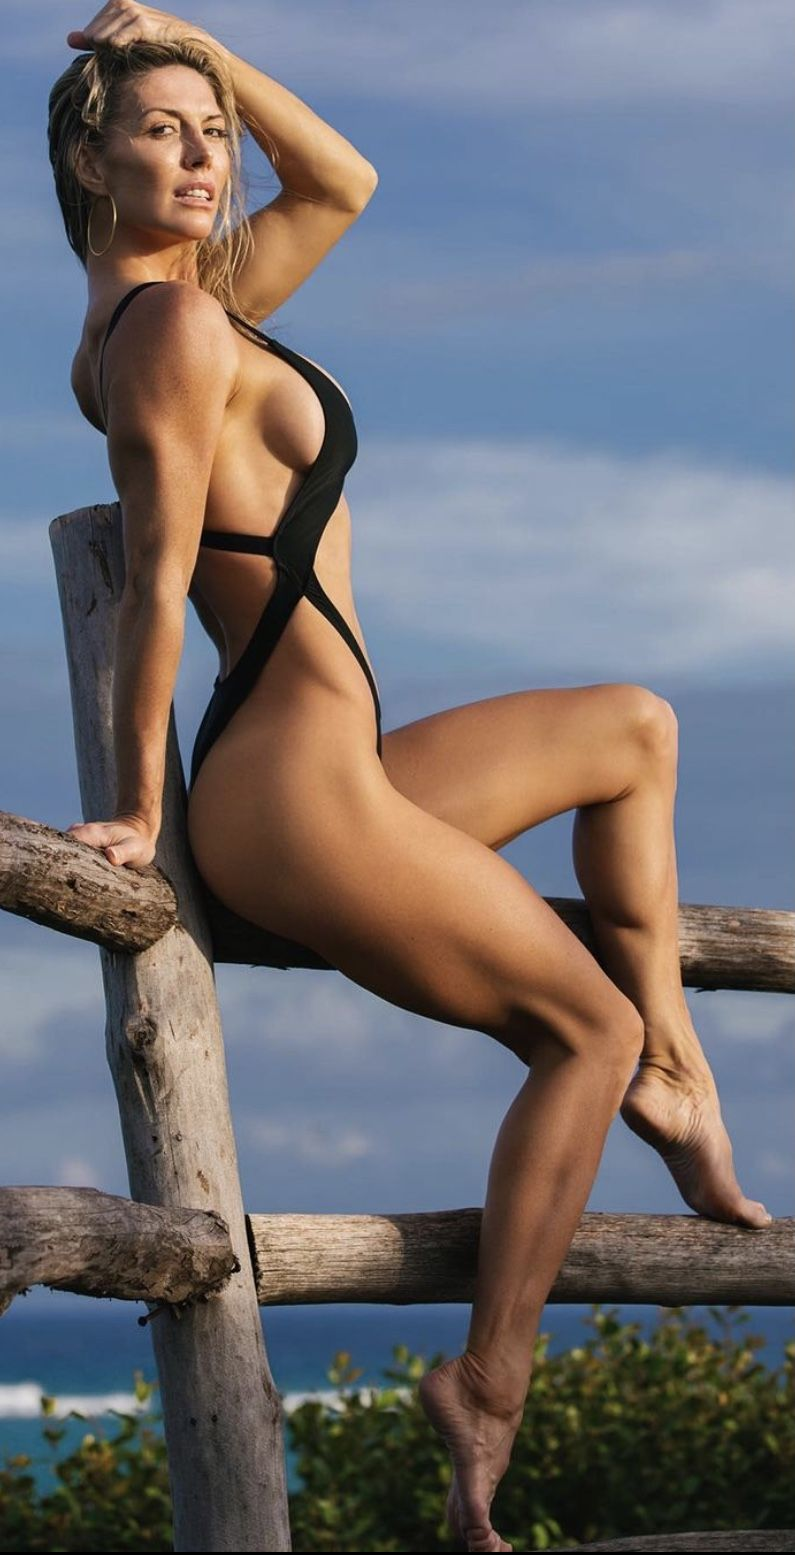 Callie bundy nude